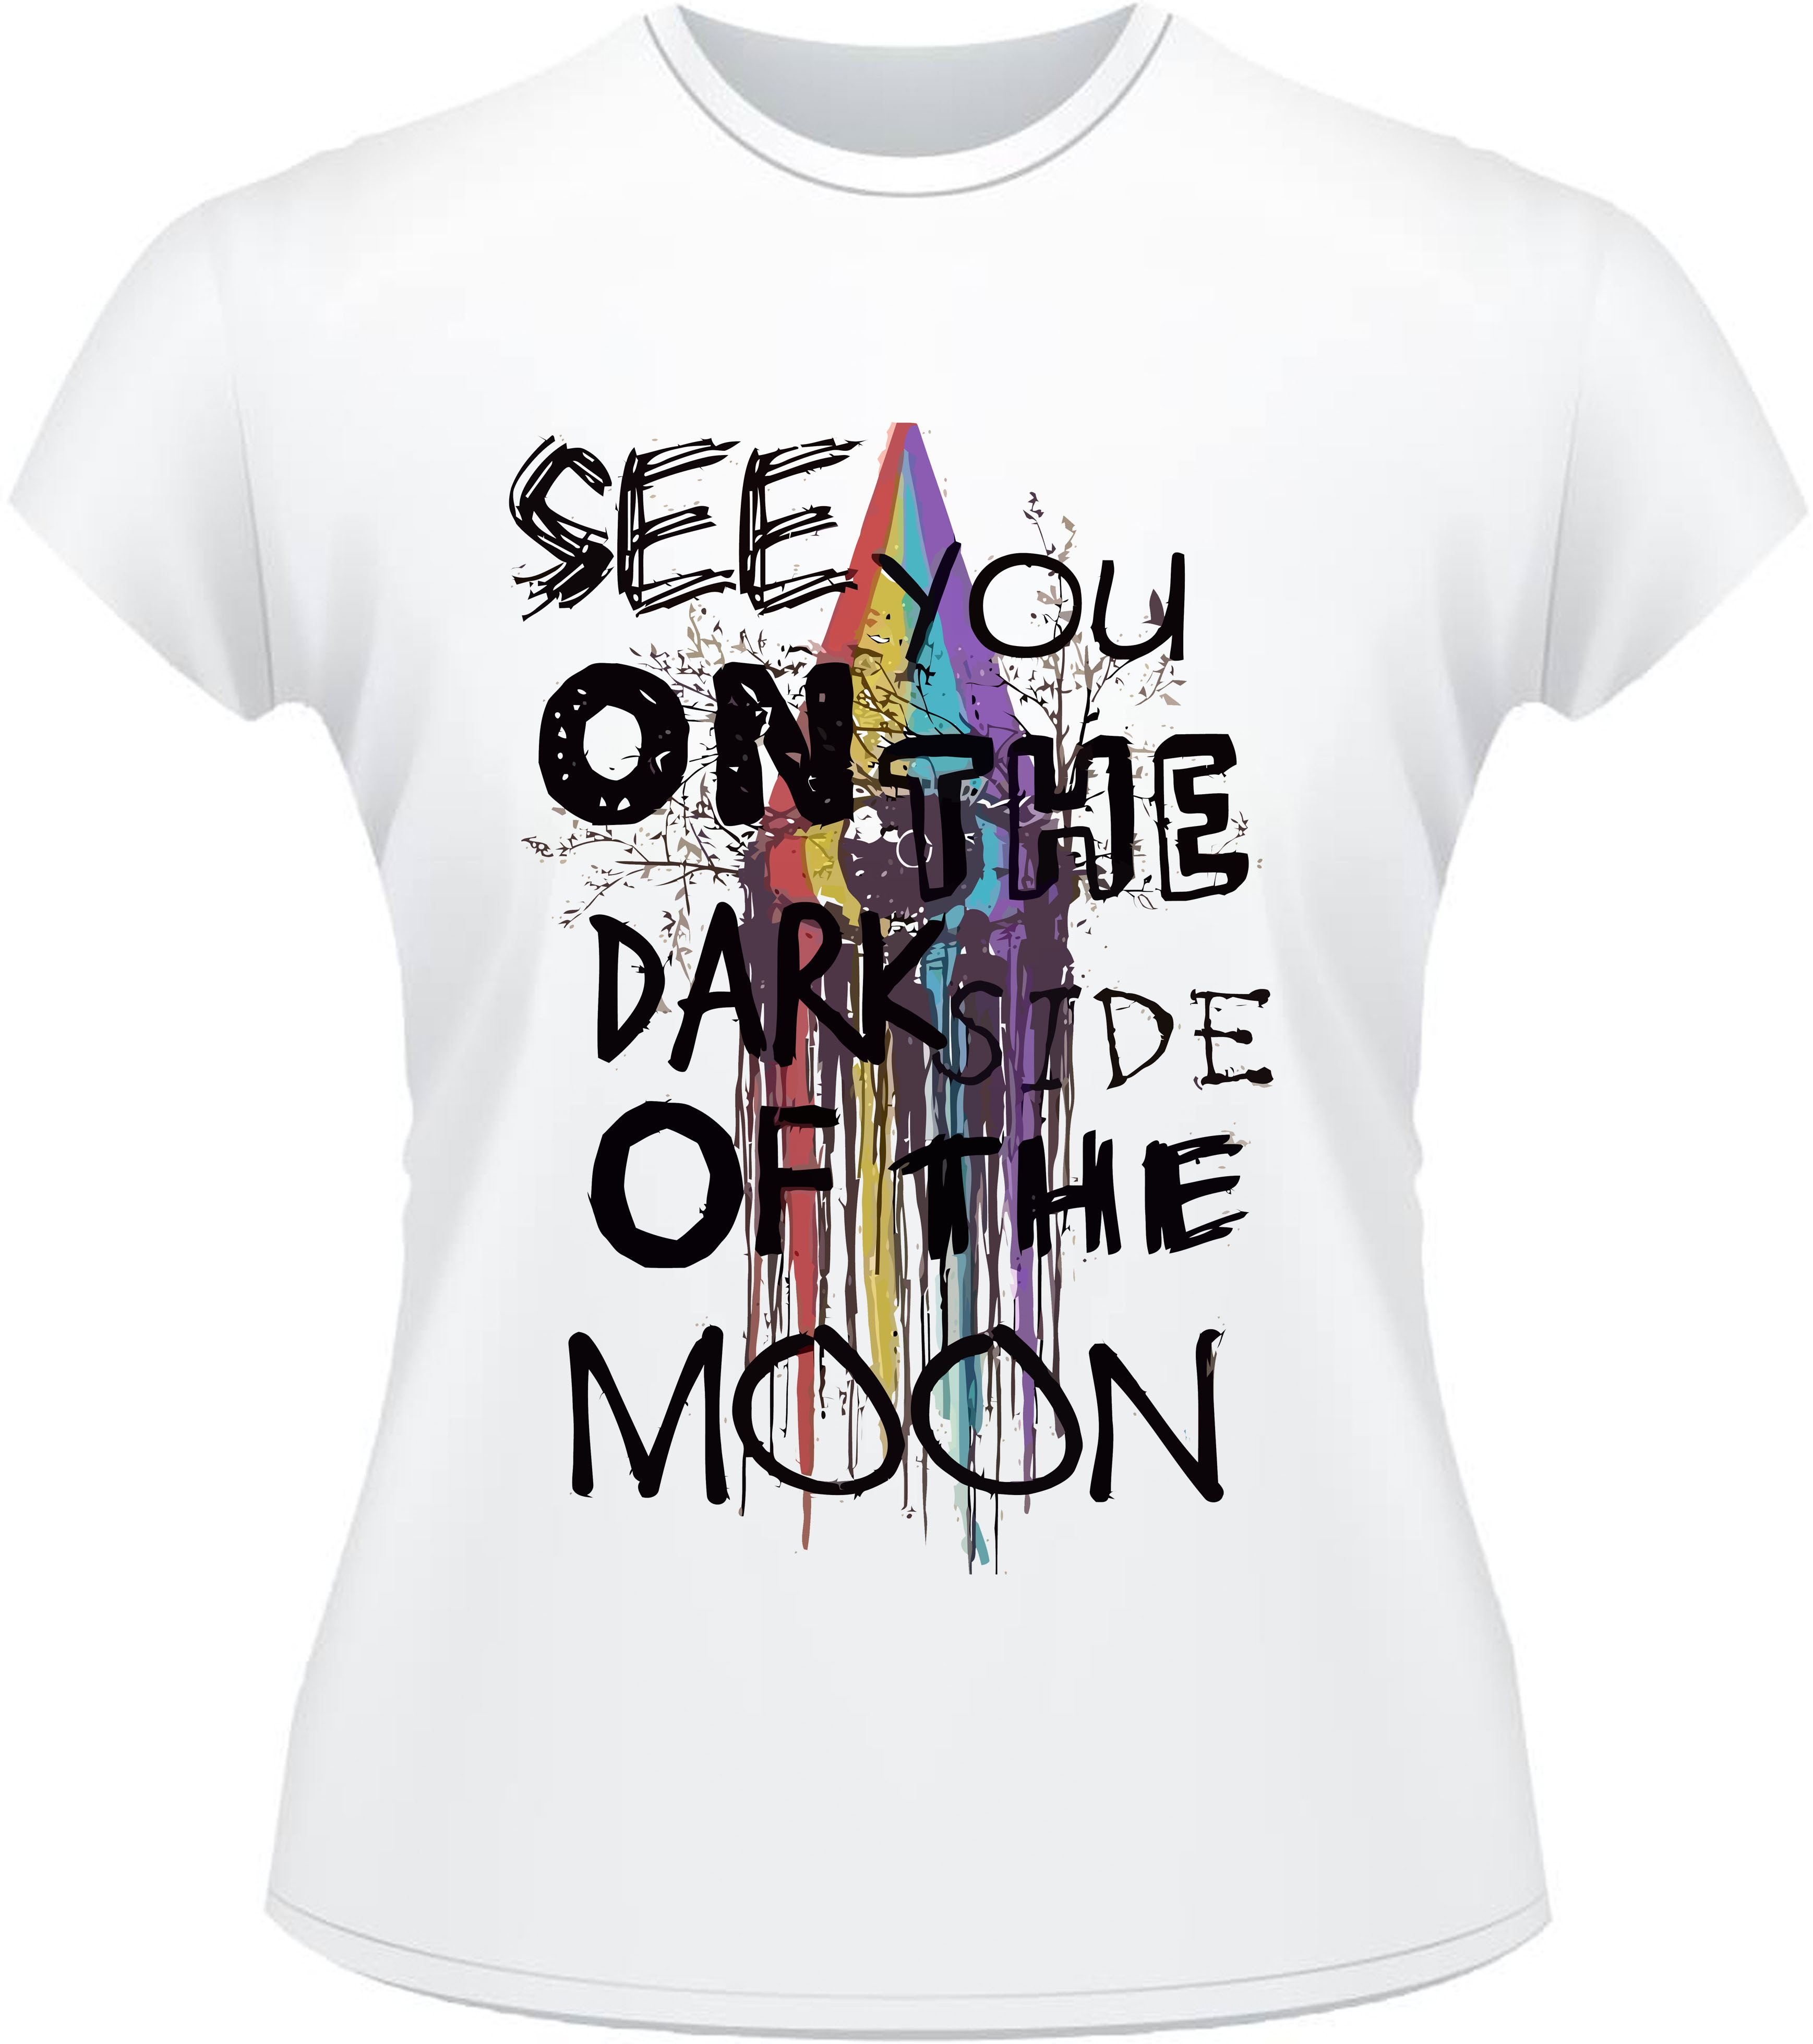 76b6d12dcc Camiseta Banda Pink Floyd Dark Side Of The Moon | Elo7